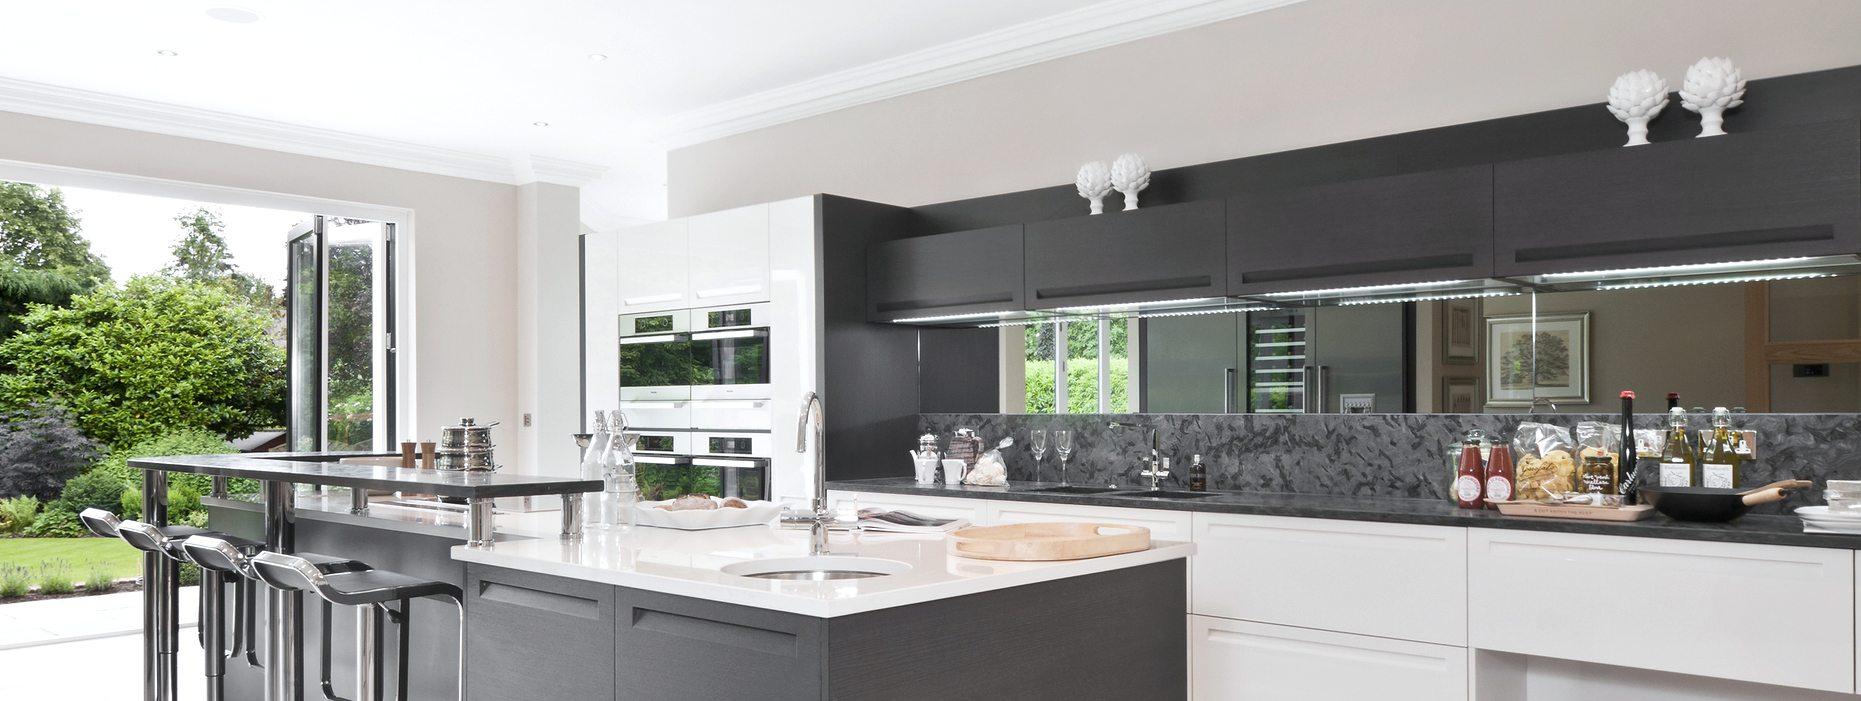 Kitchen - Mirrored Splashbacks